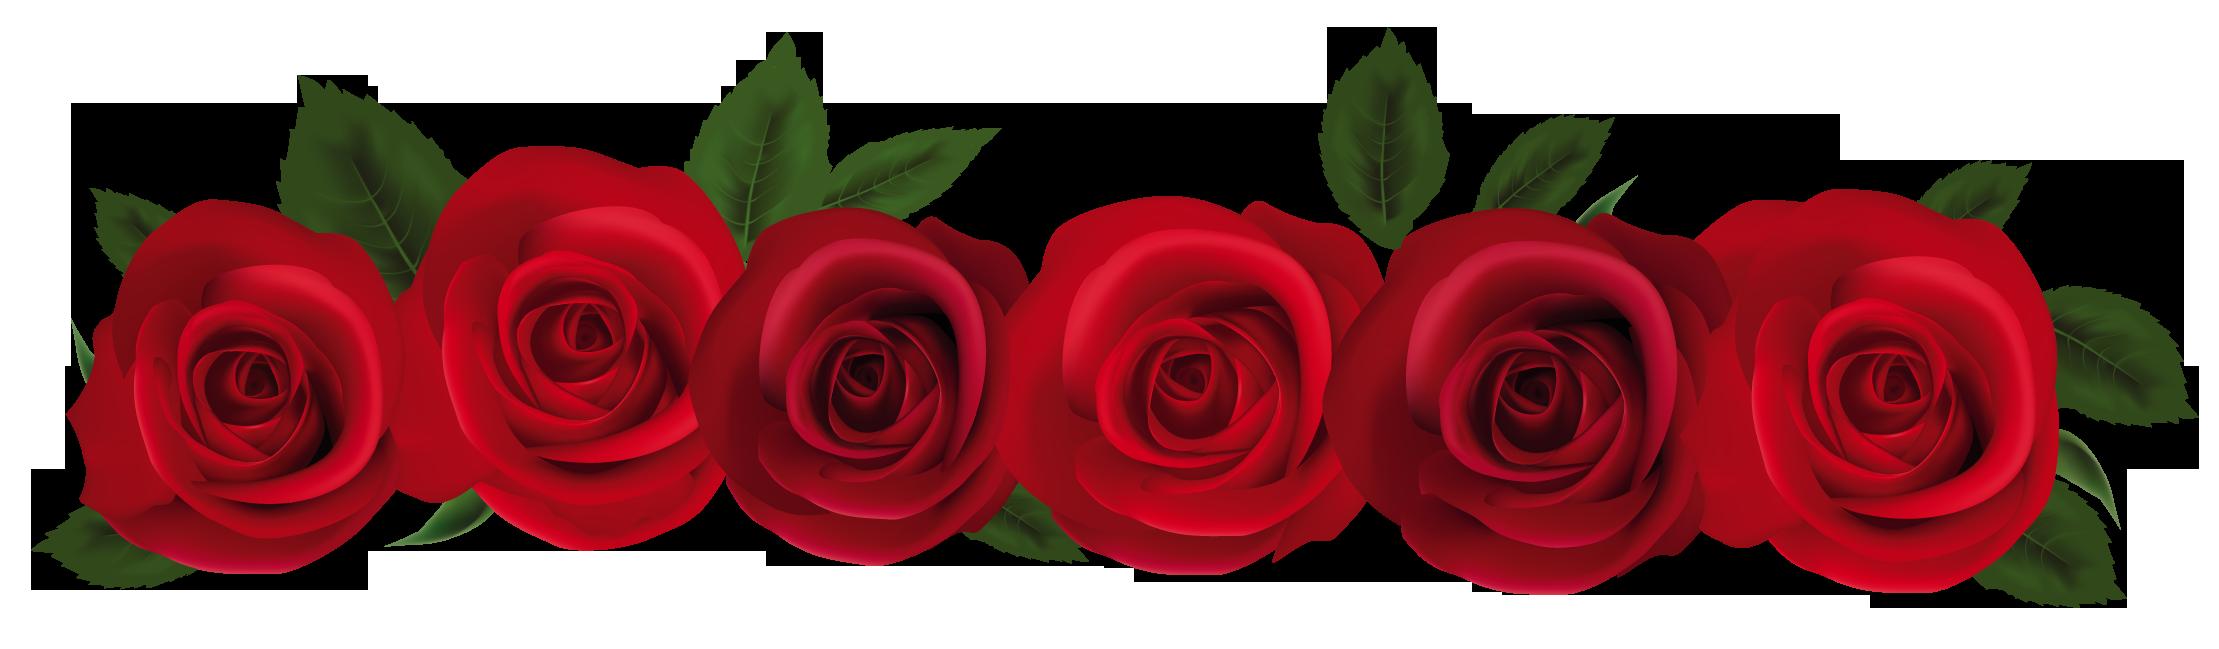 Rose Clip Art Border-rose clip art border-14